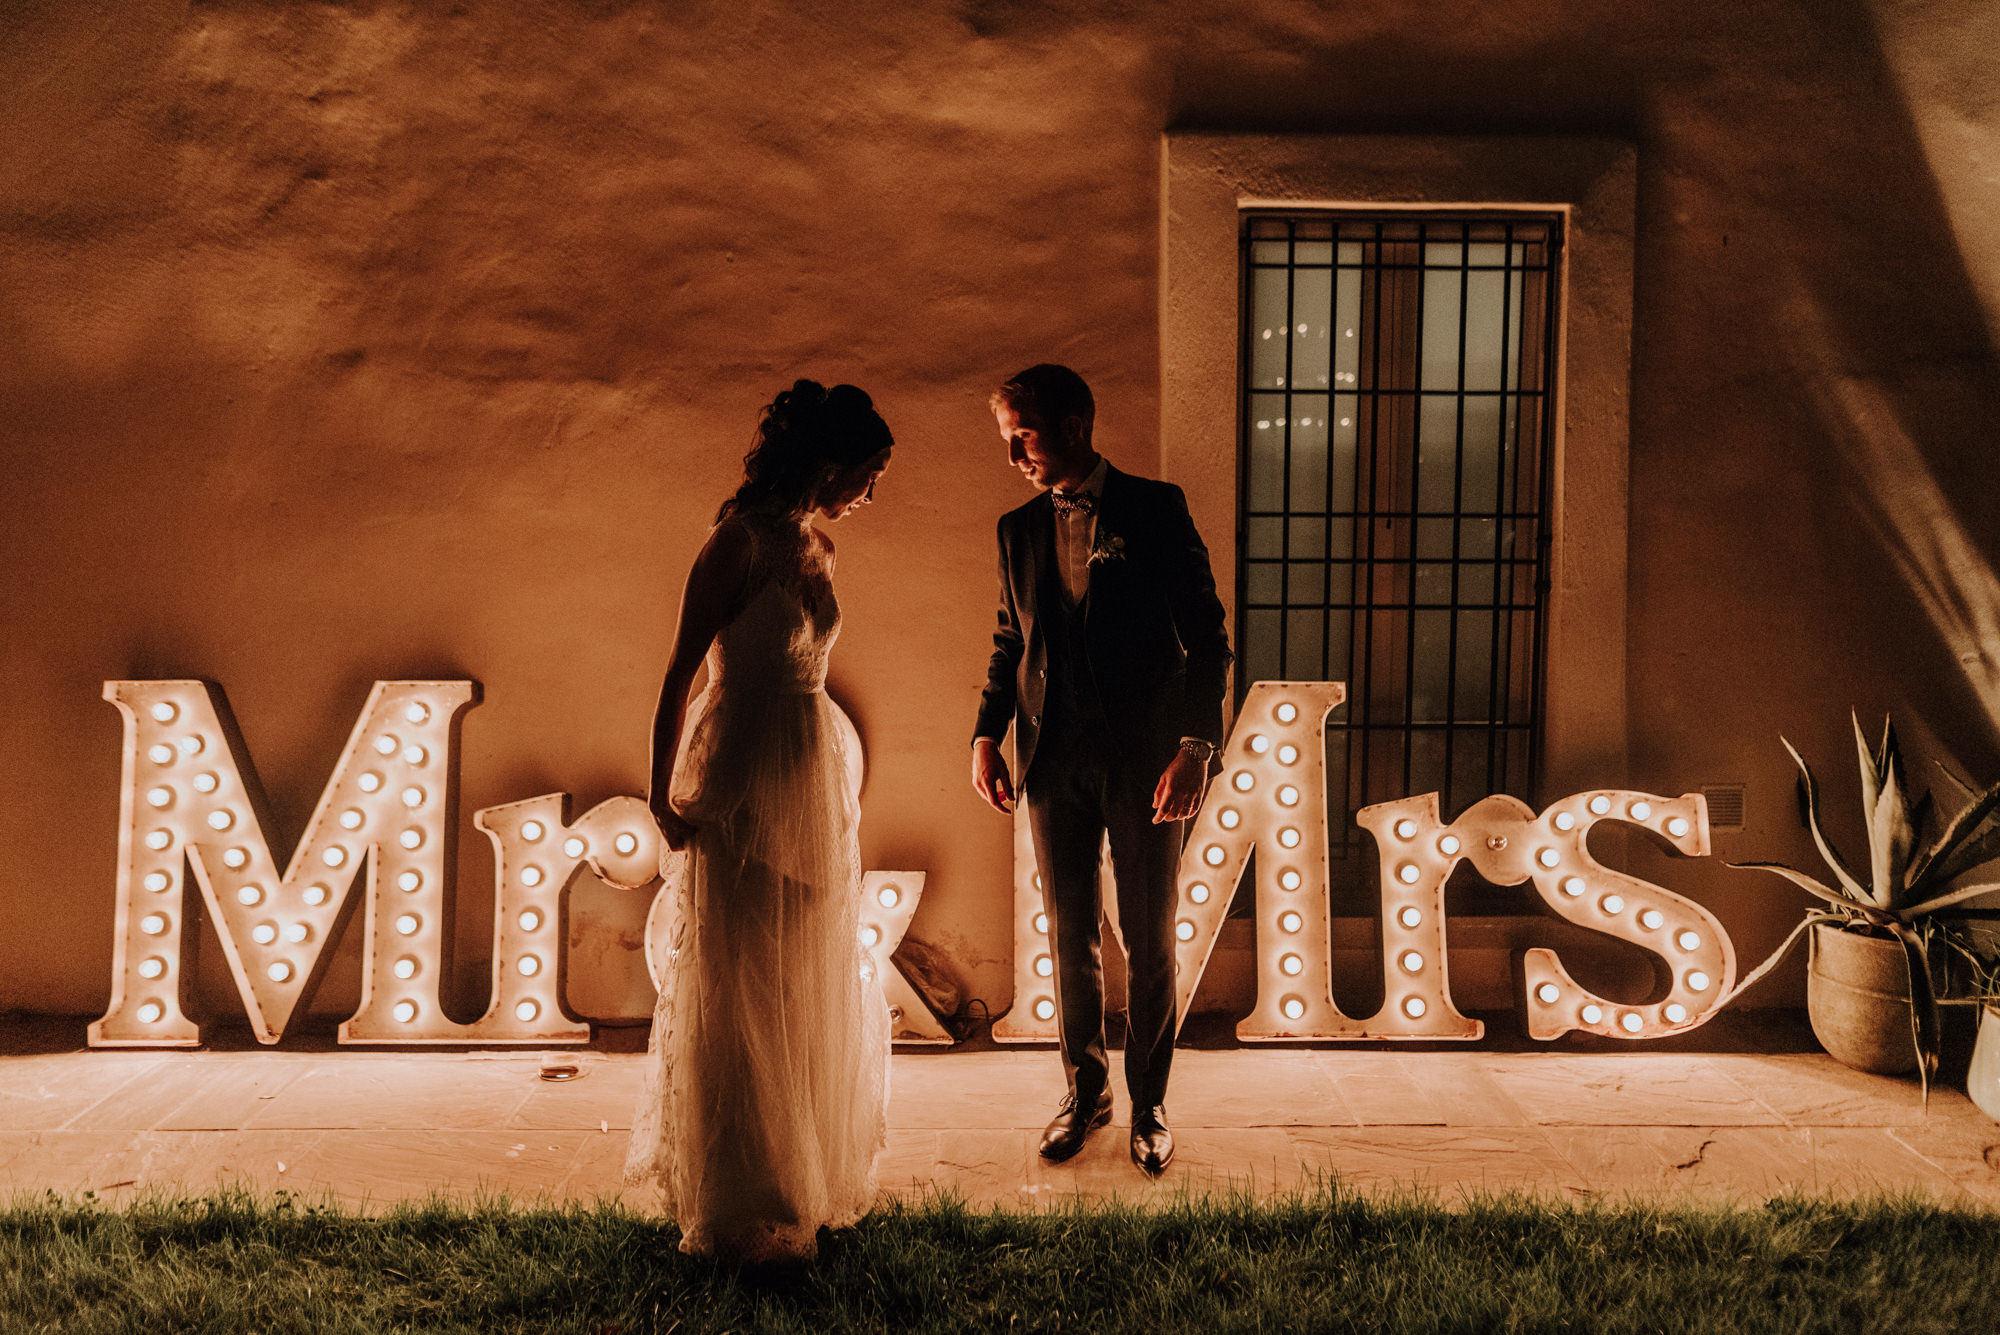 FOTO+PHOTO+BODA+WEDDING+ITALIA+ITALY+MAURICIO+GARAY+MAURICIOGARAY+WEDDINPHOTOGRAPHER+FOTOGRAFODEBODA-2021.jpg